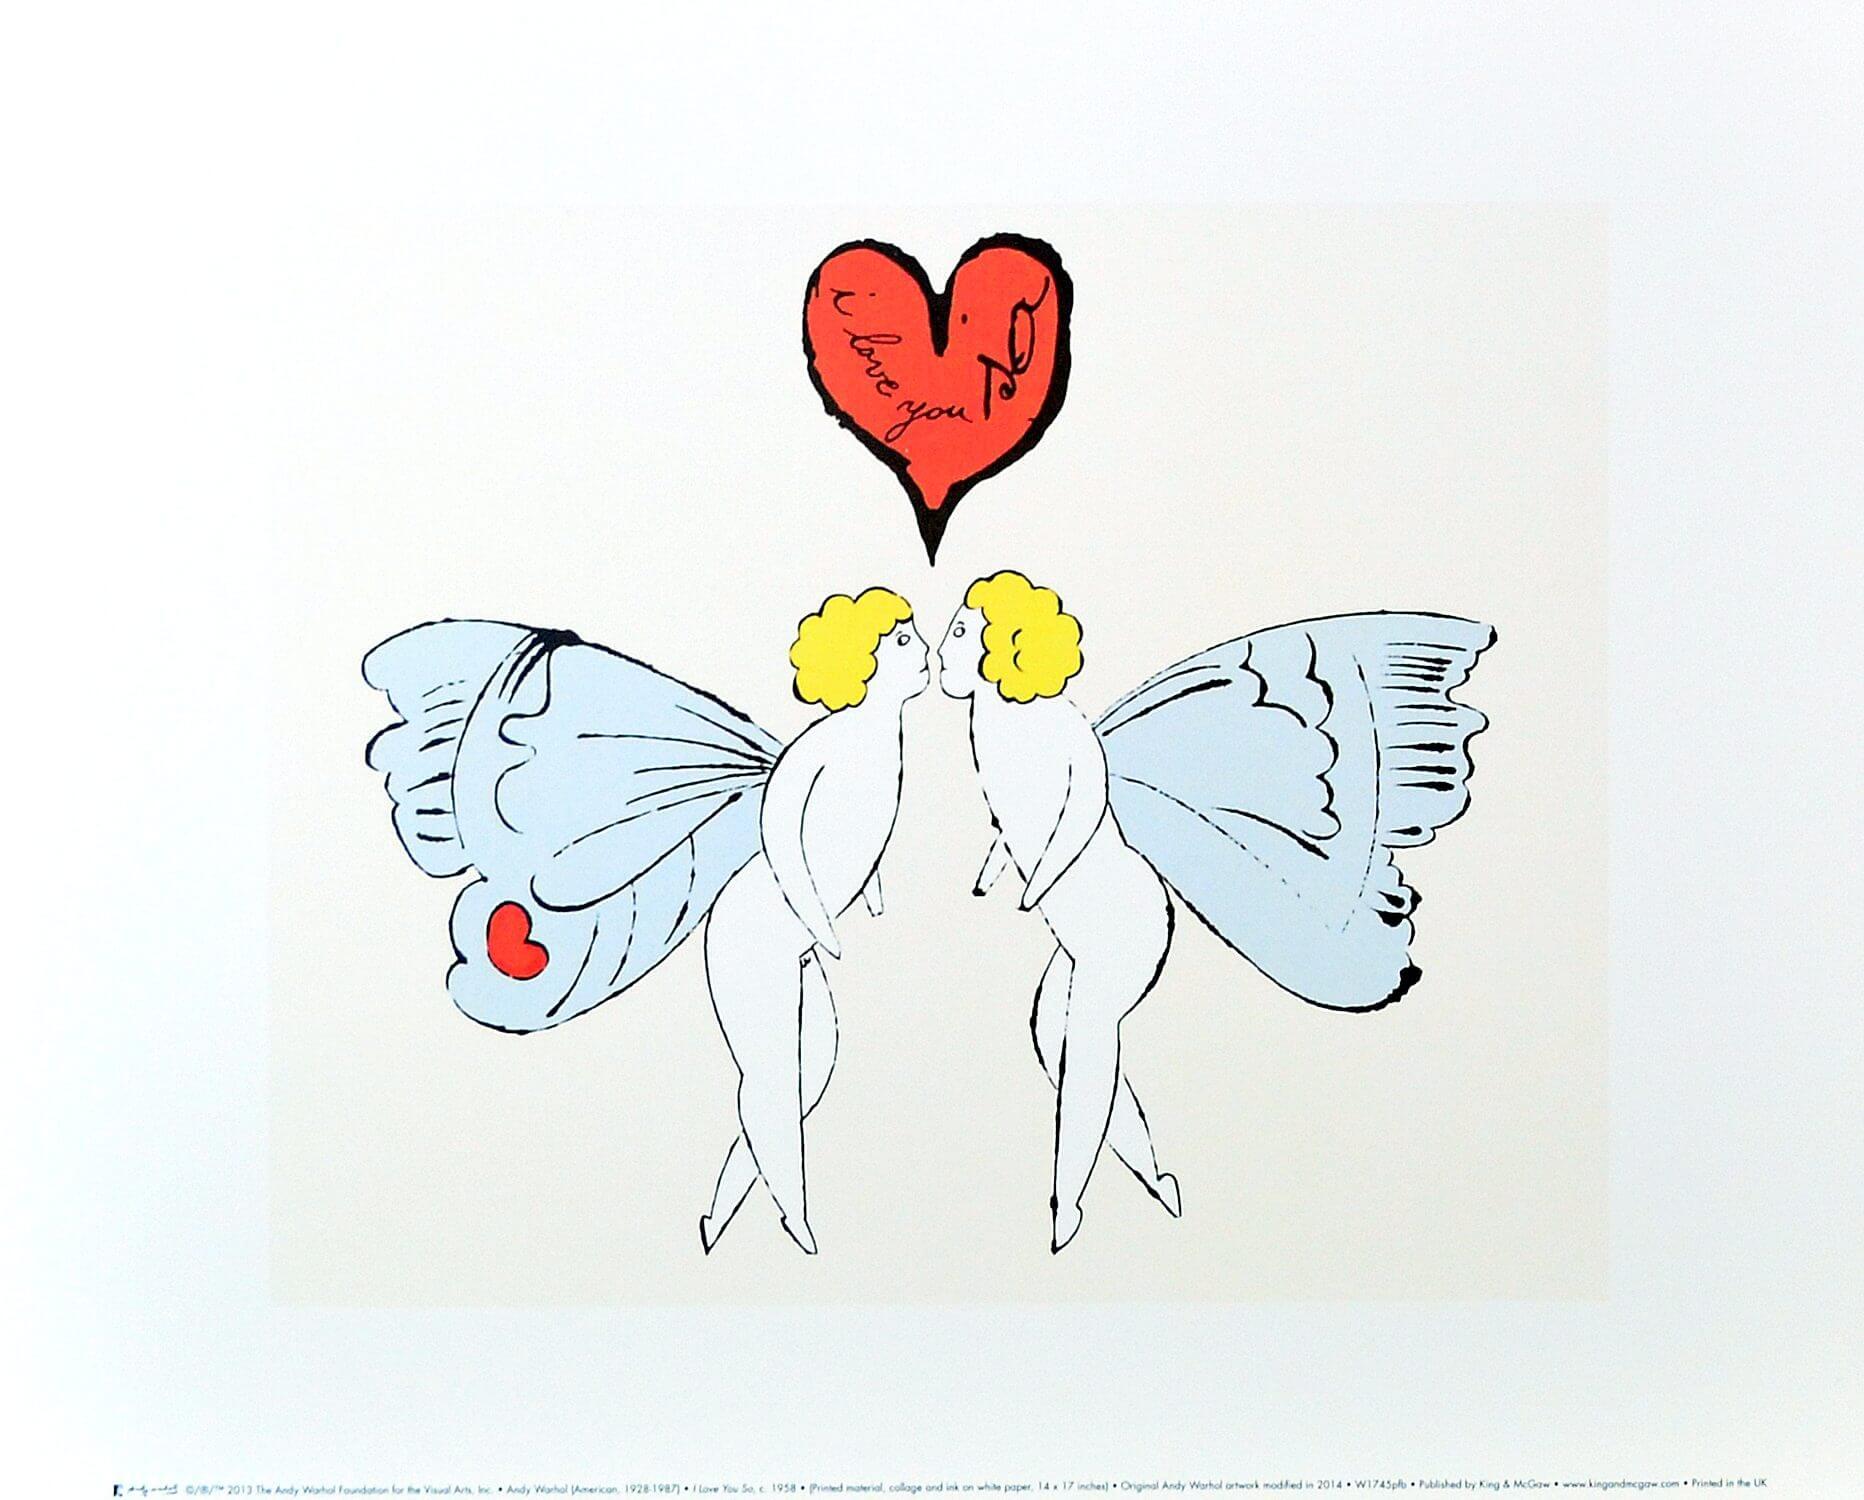 Pop Heart頸鏈便是受其畫作《I Love You So (Angel)》啟發,畫中天使的藍色雙翼和濃烈的愛意化為一顆耀目的53.80克拉坦桑石,狂放又浪漫,將普普藝術融入了高級珠寶。